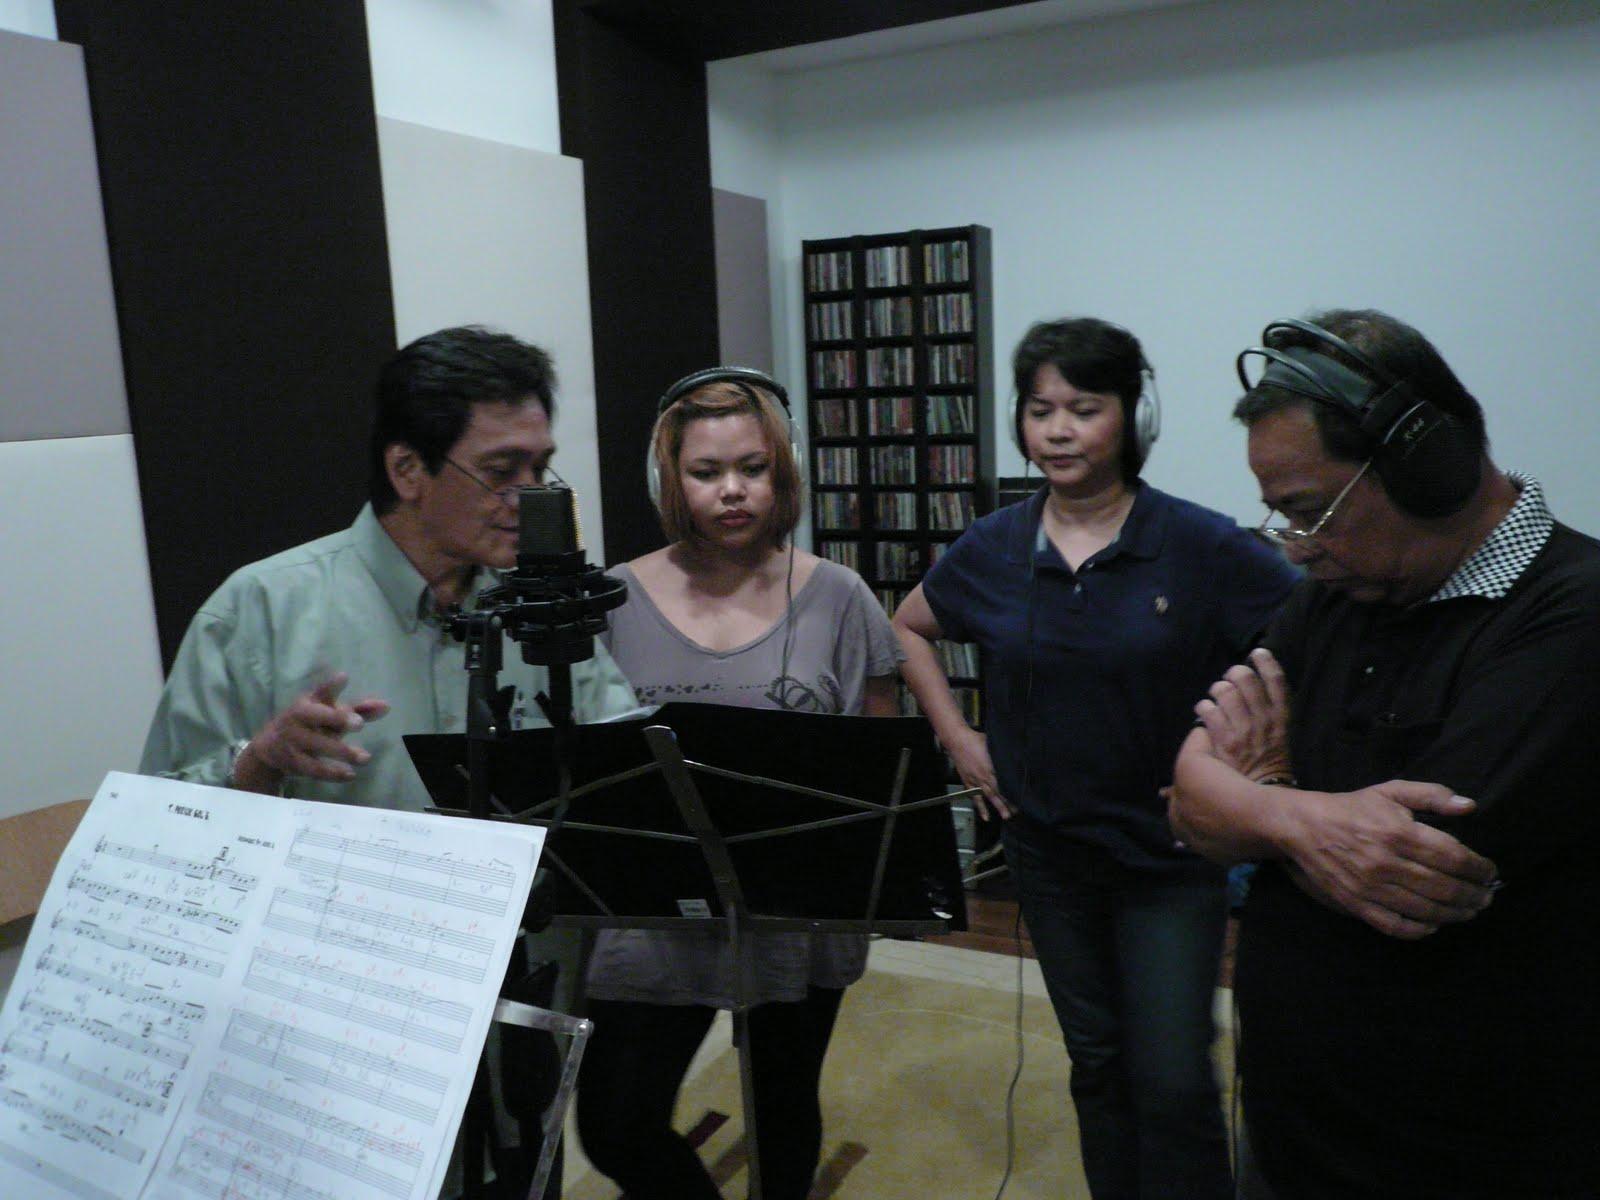 http://1.bp.blogspot.com/_nZh0l1CipXY/TA_h1HnLn7I/AAAAAAAADow/s_pfqD43FmY/s1600/Solianos+Recording+Day+2+012.jpg